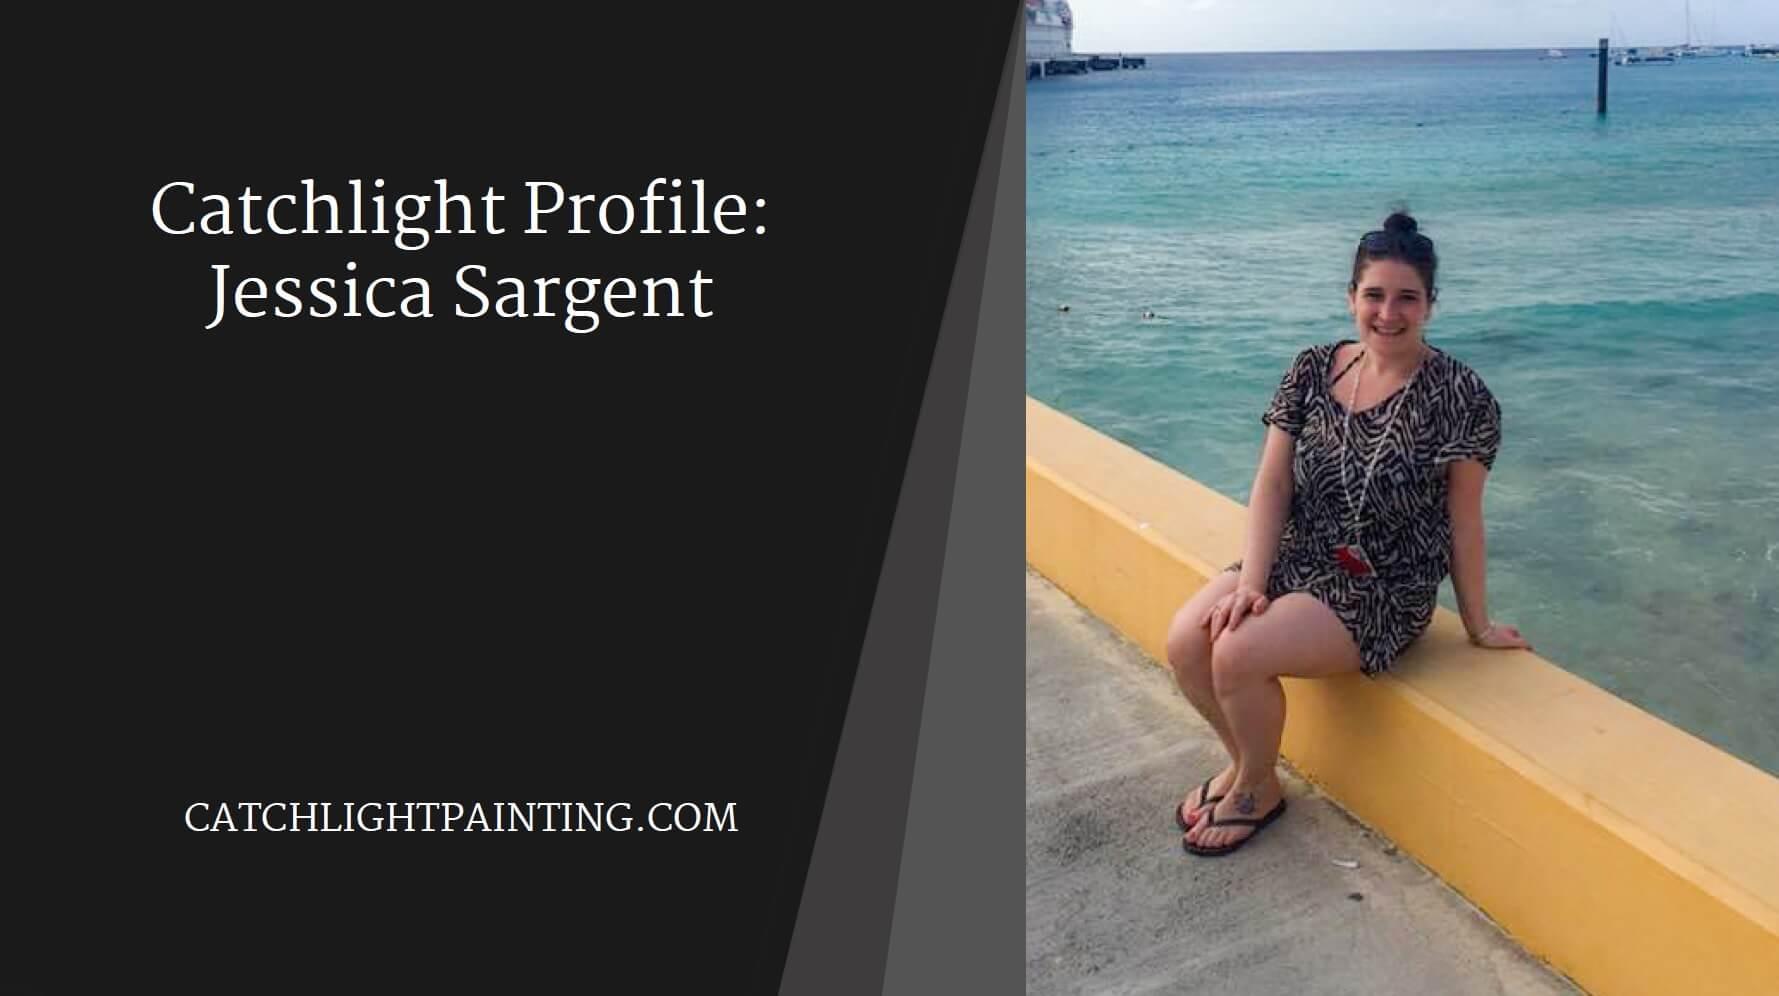 Catchlight Profile: Jessica Sargent